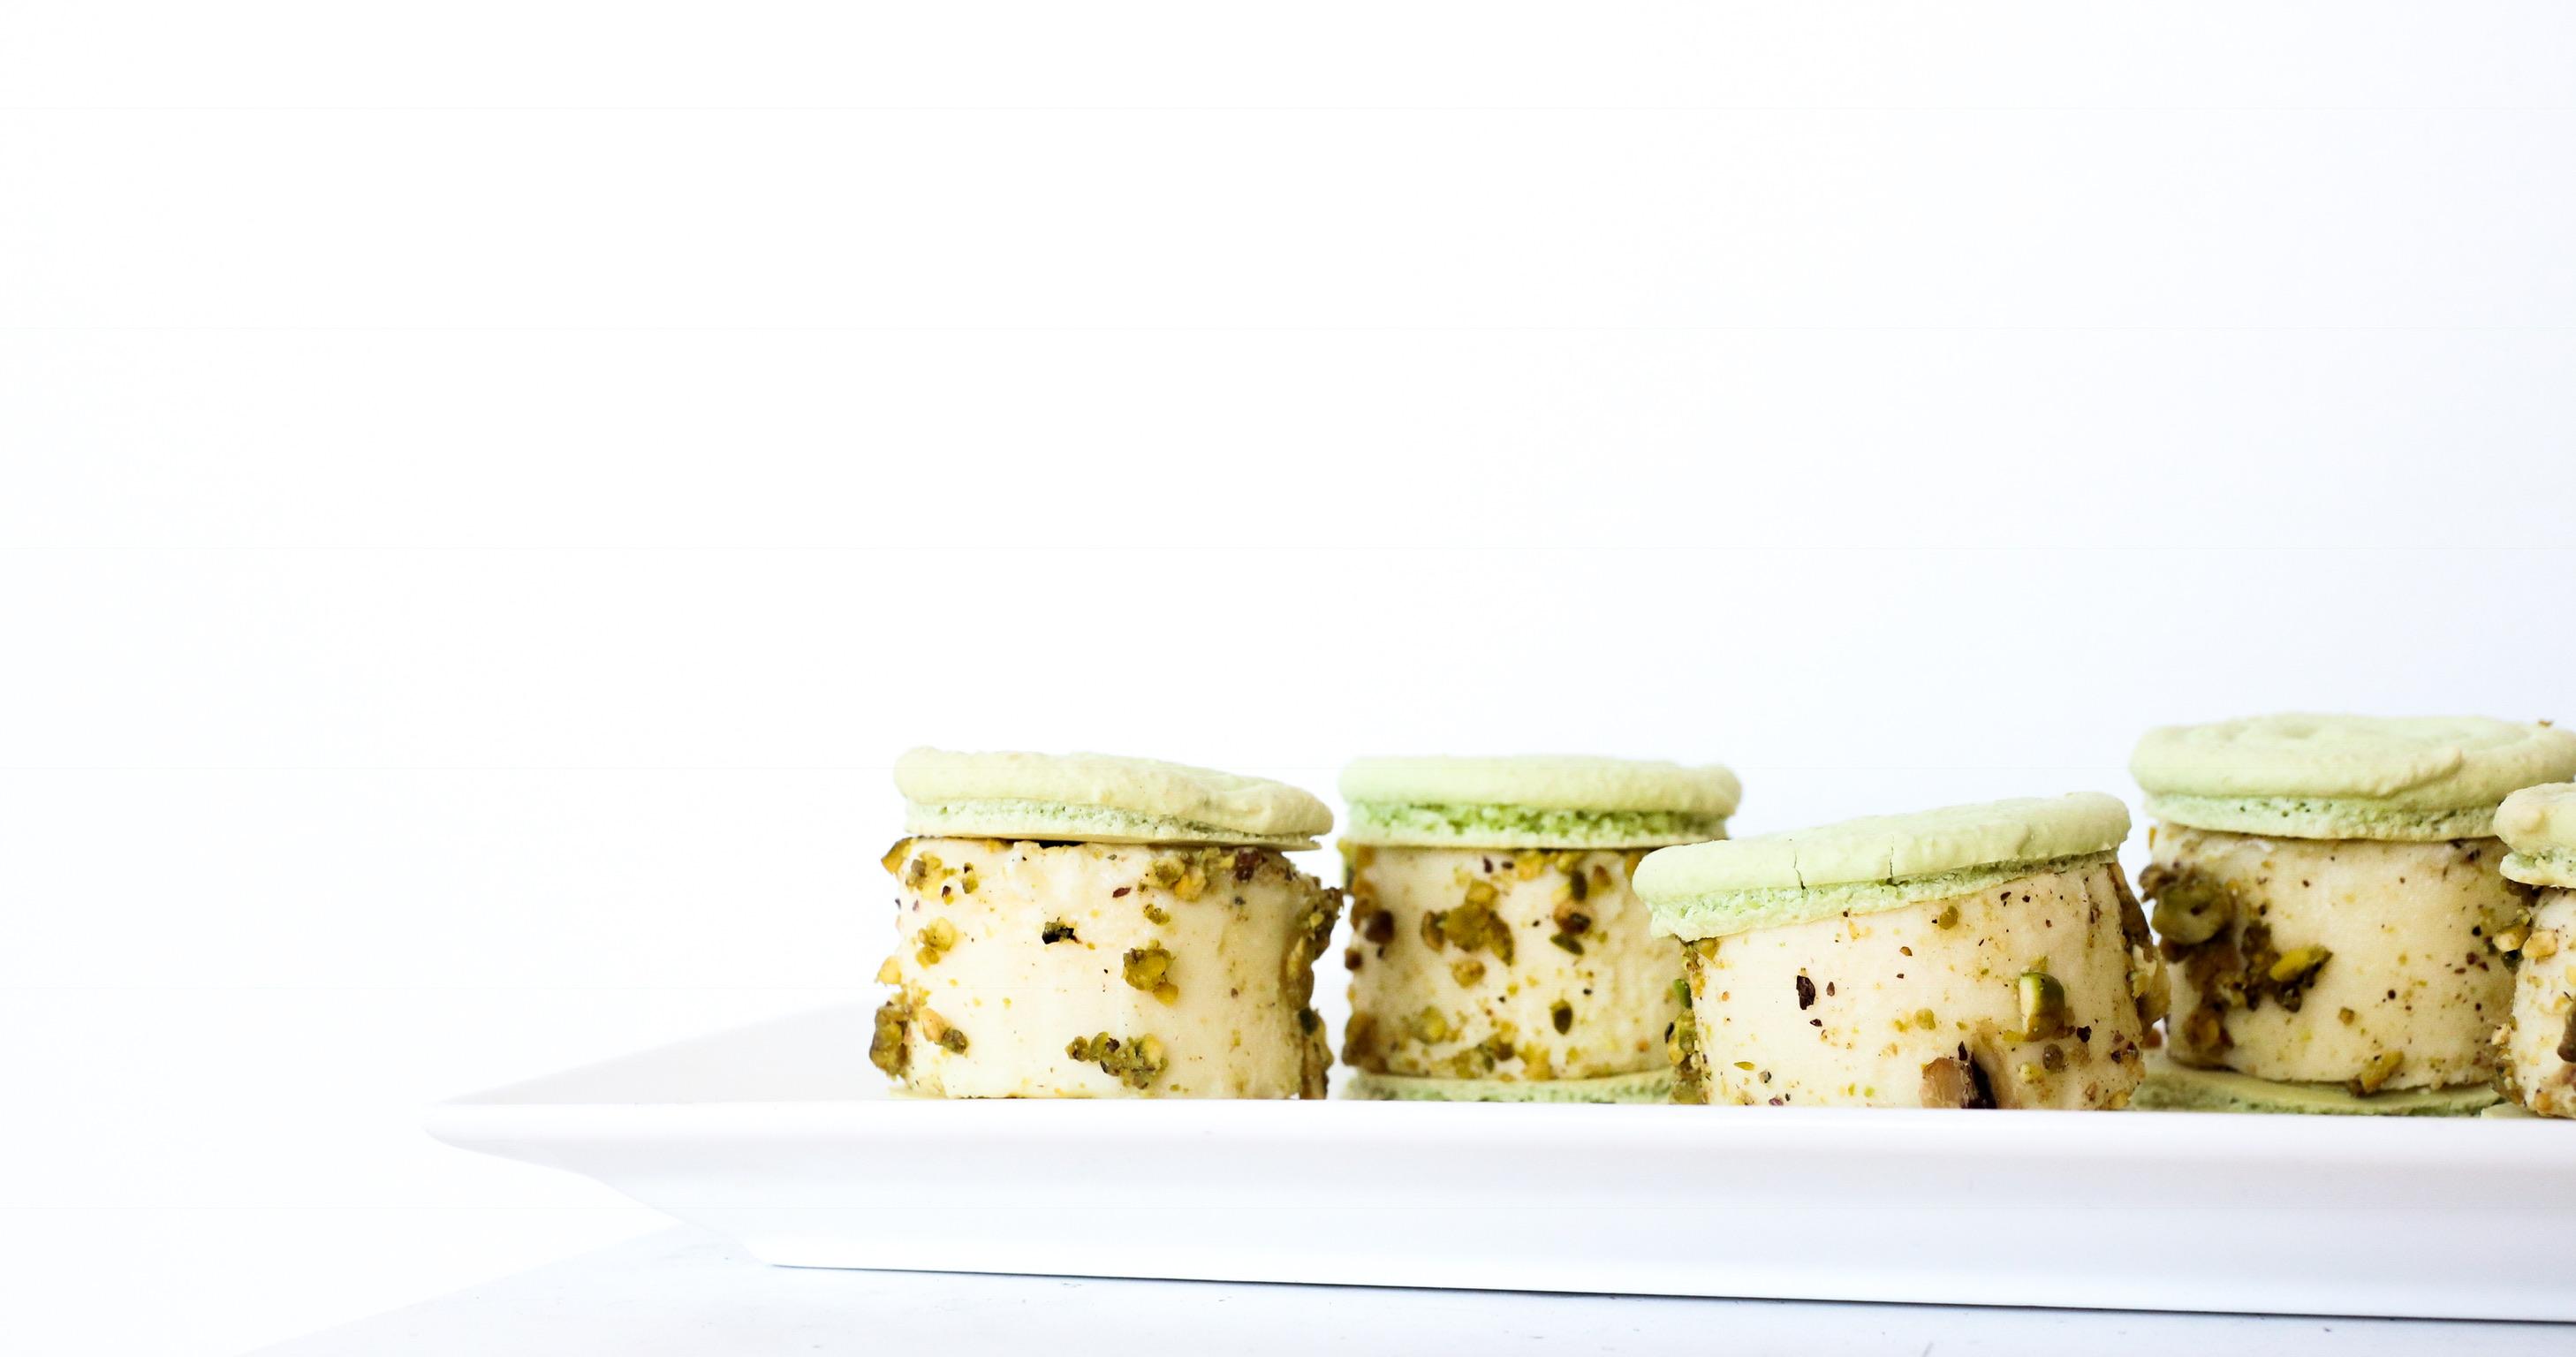 Macaron ice cream sandwiches!